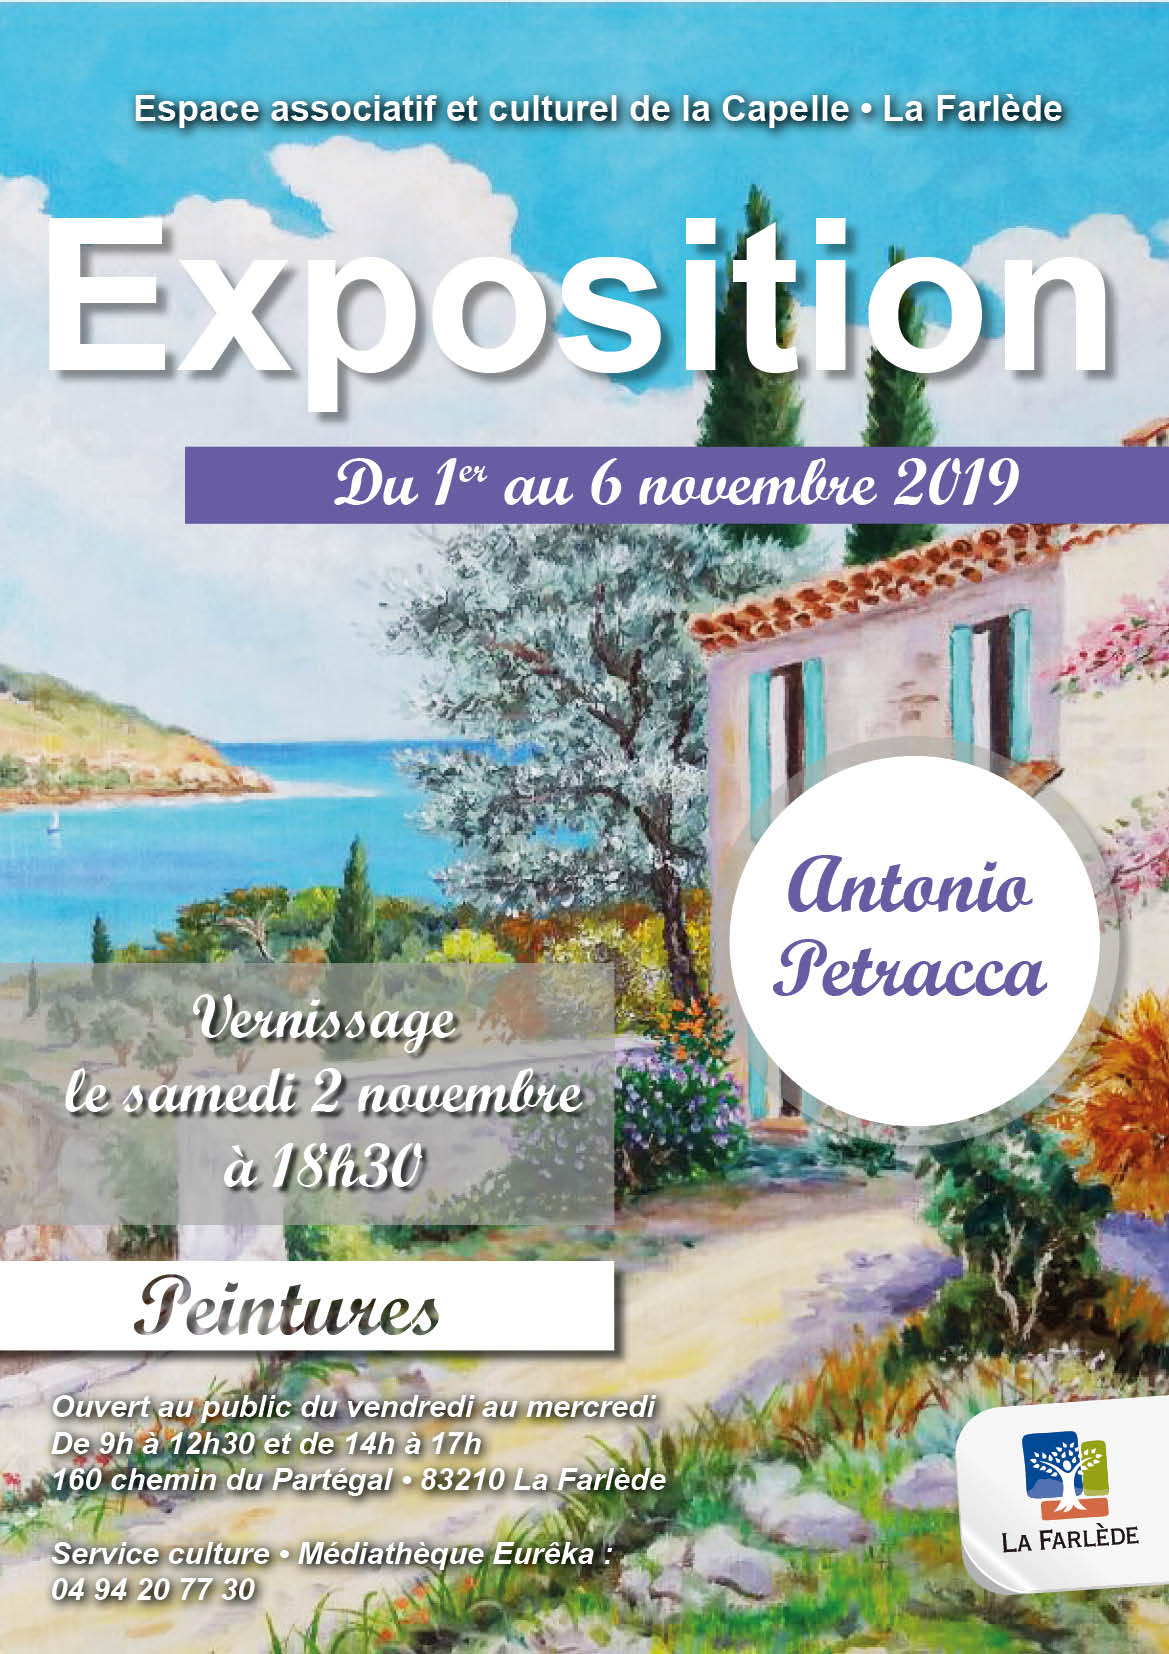 aw-web-affiche-a3-expo-antonio_petracca.jpg